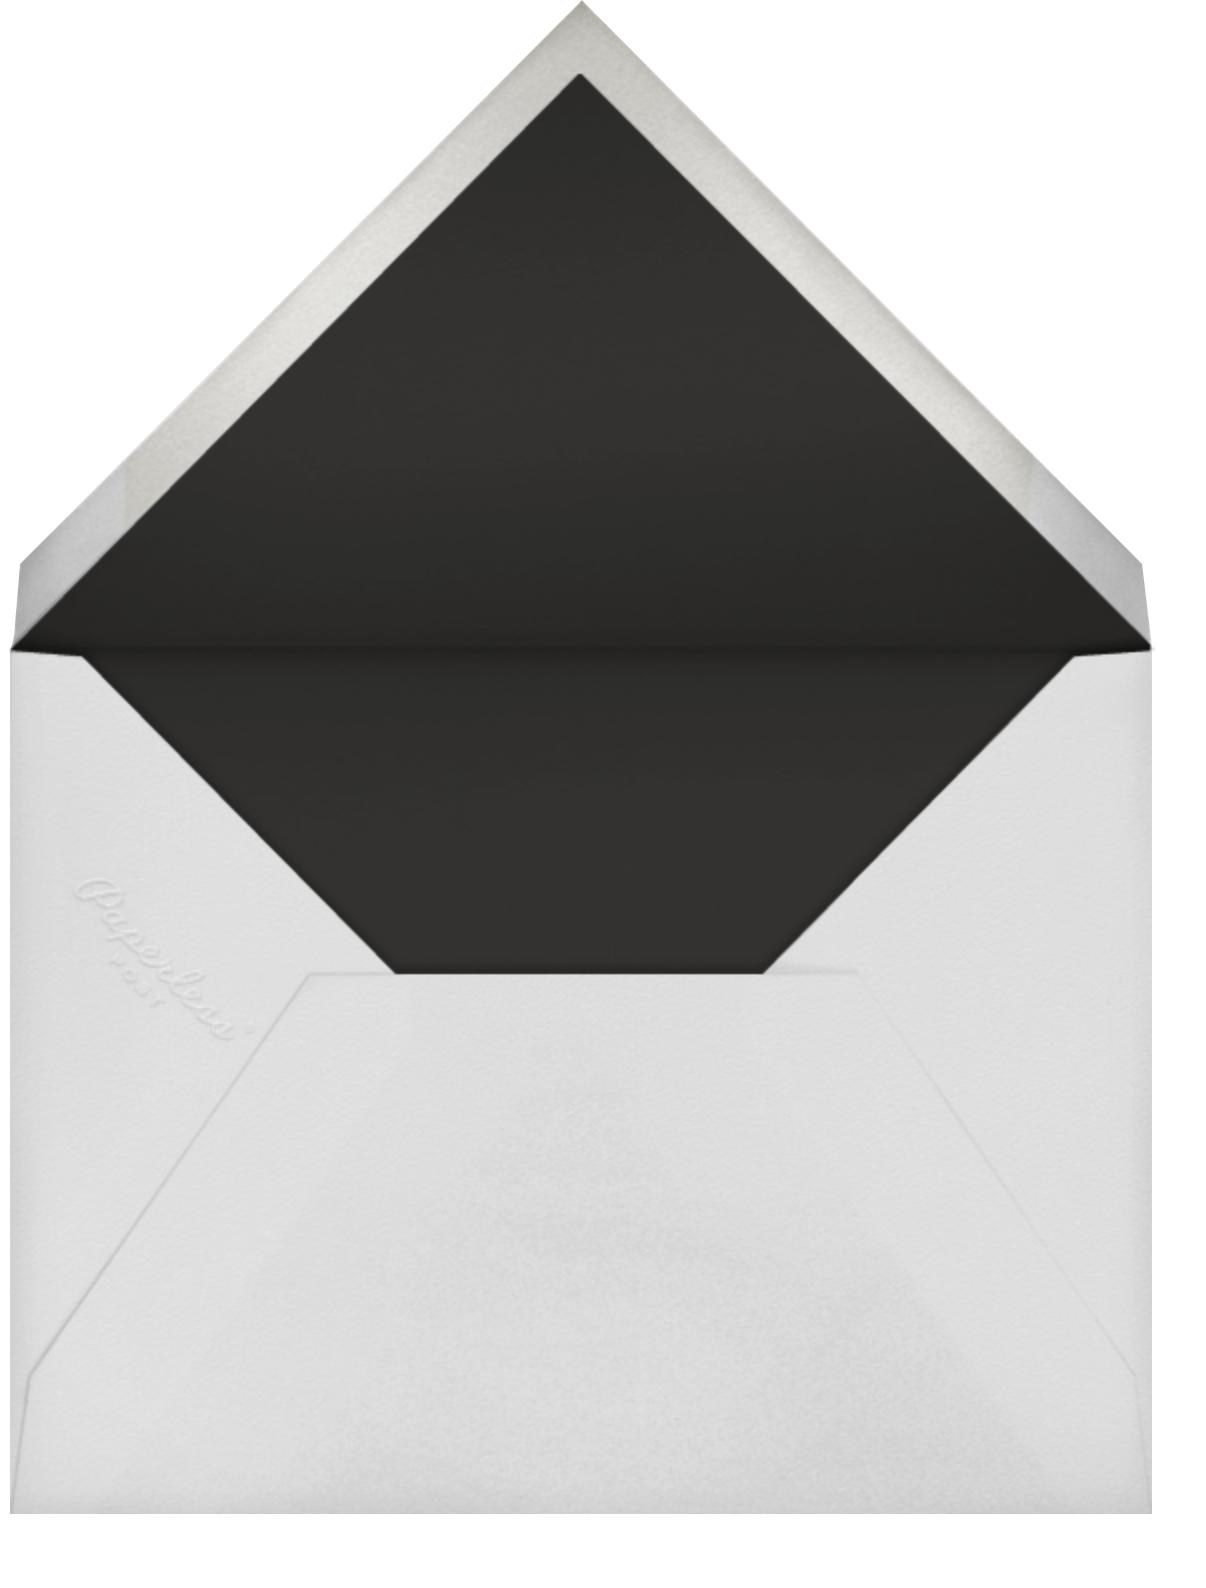 Gardenia - White/Rose Gold - Oscar de la Renta - Bat and bar mitzvah - envelope back